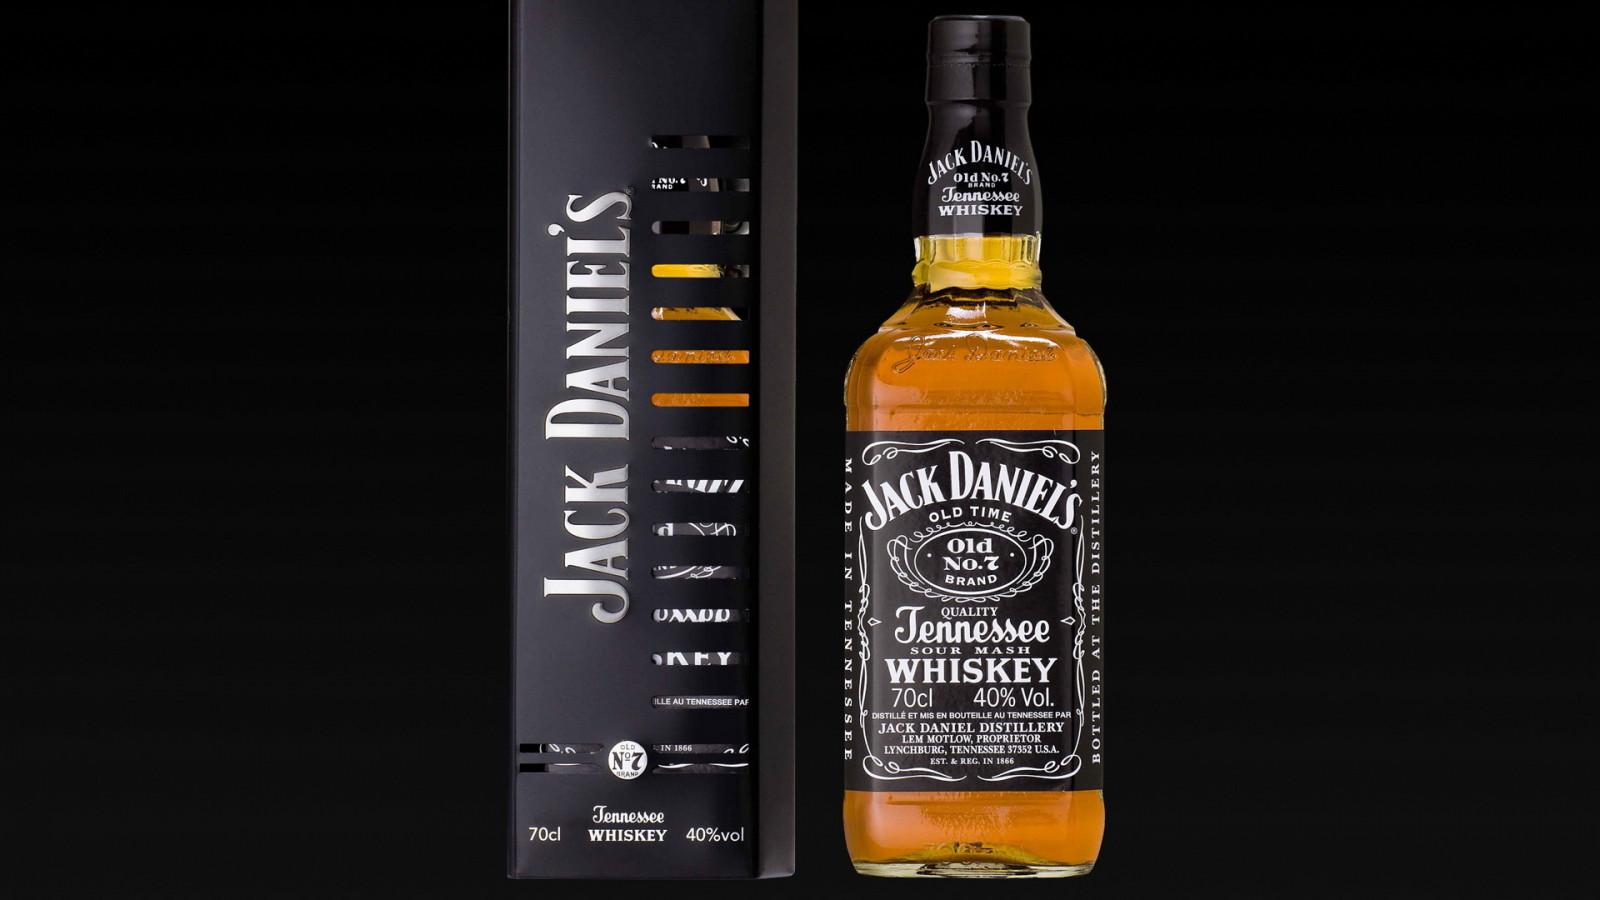 Wallpaper : botol, minum, alkohol, wiski, Jack Daniels ...